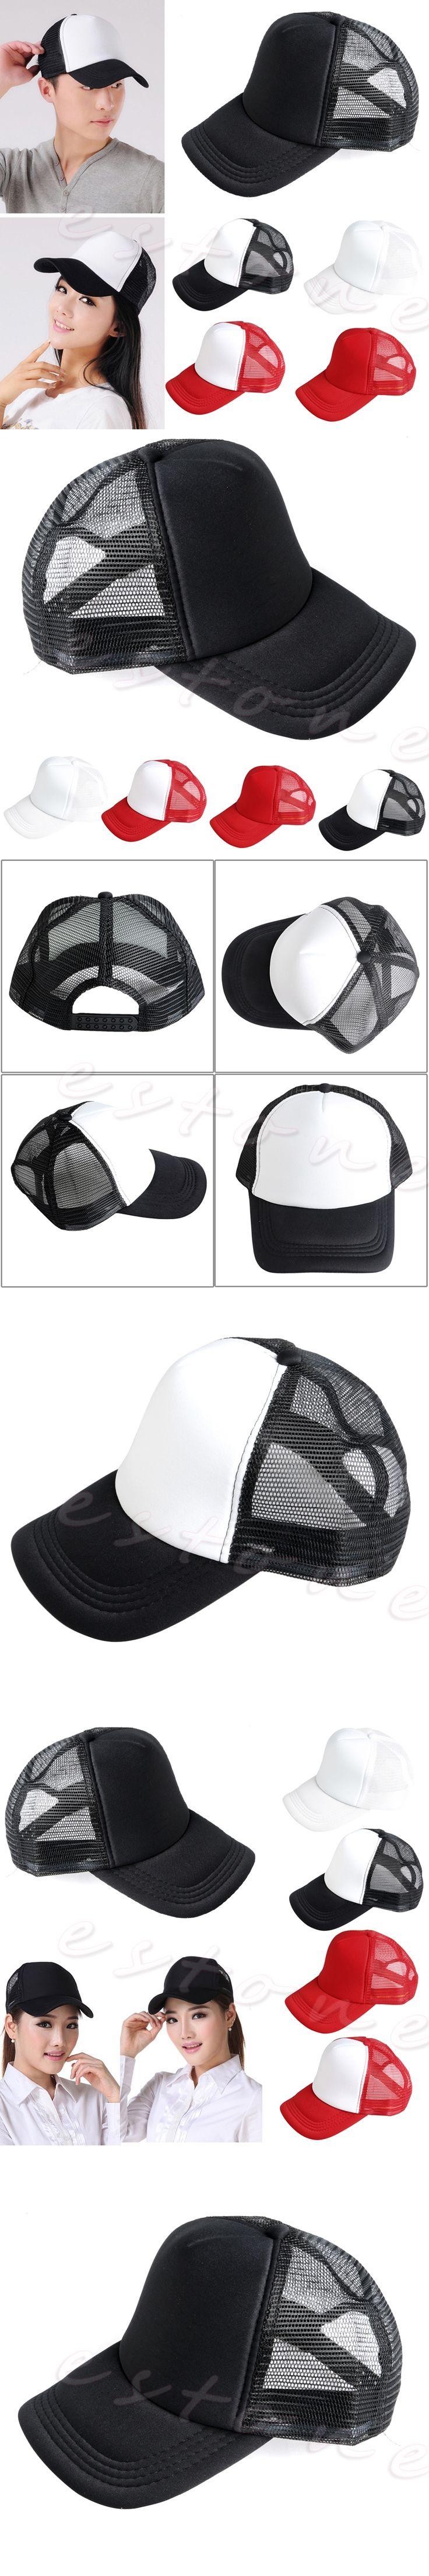 Unisex Adjustable Blank Curved Visor Hat Plain Baseball Cap Solid Trucker Patterned Light Board Brisk Breathable Mesh Cap